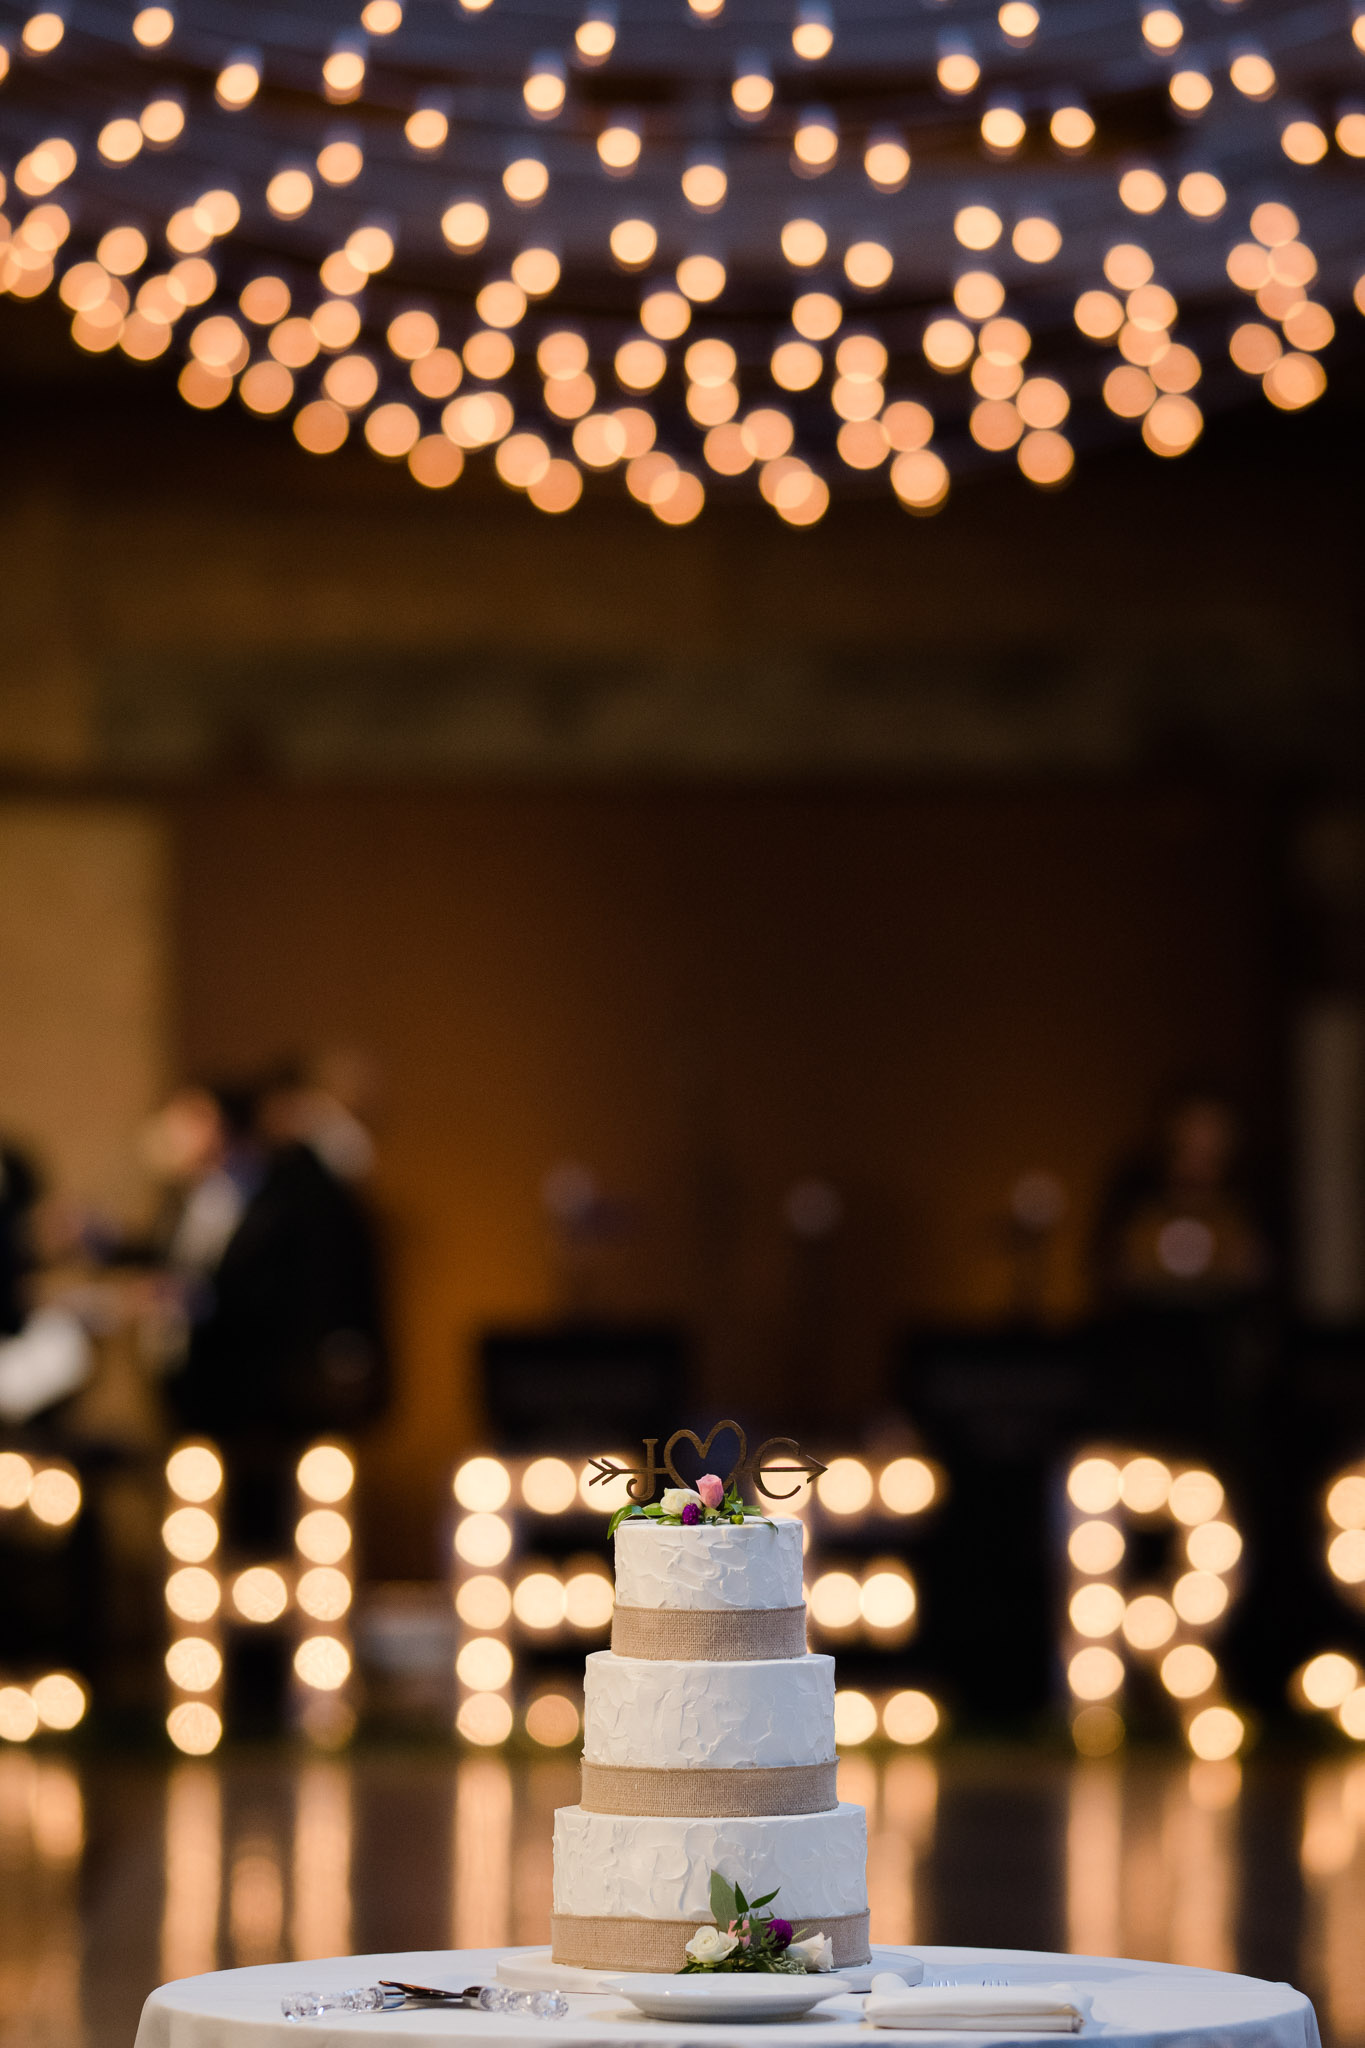 bridgeport-art-center-wedding-photos-32.jpg